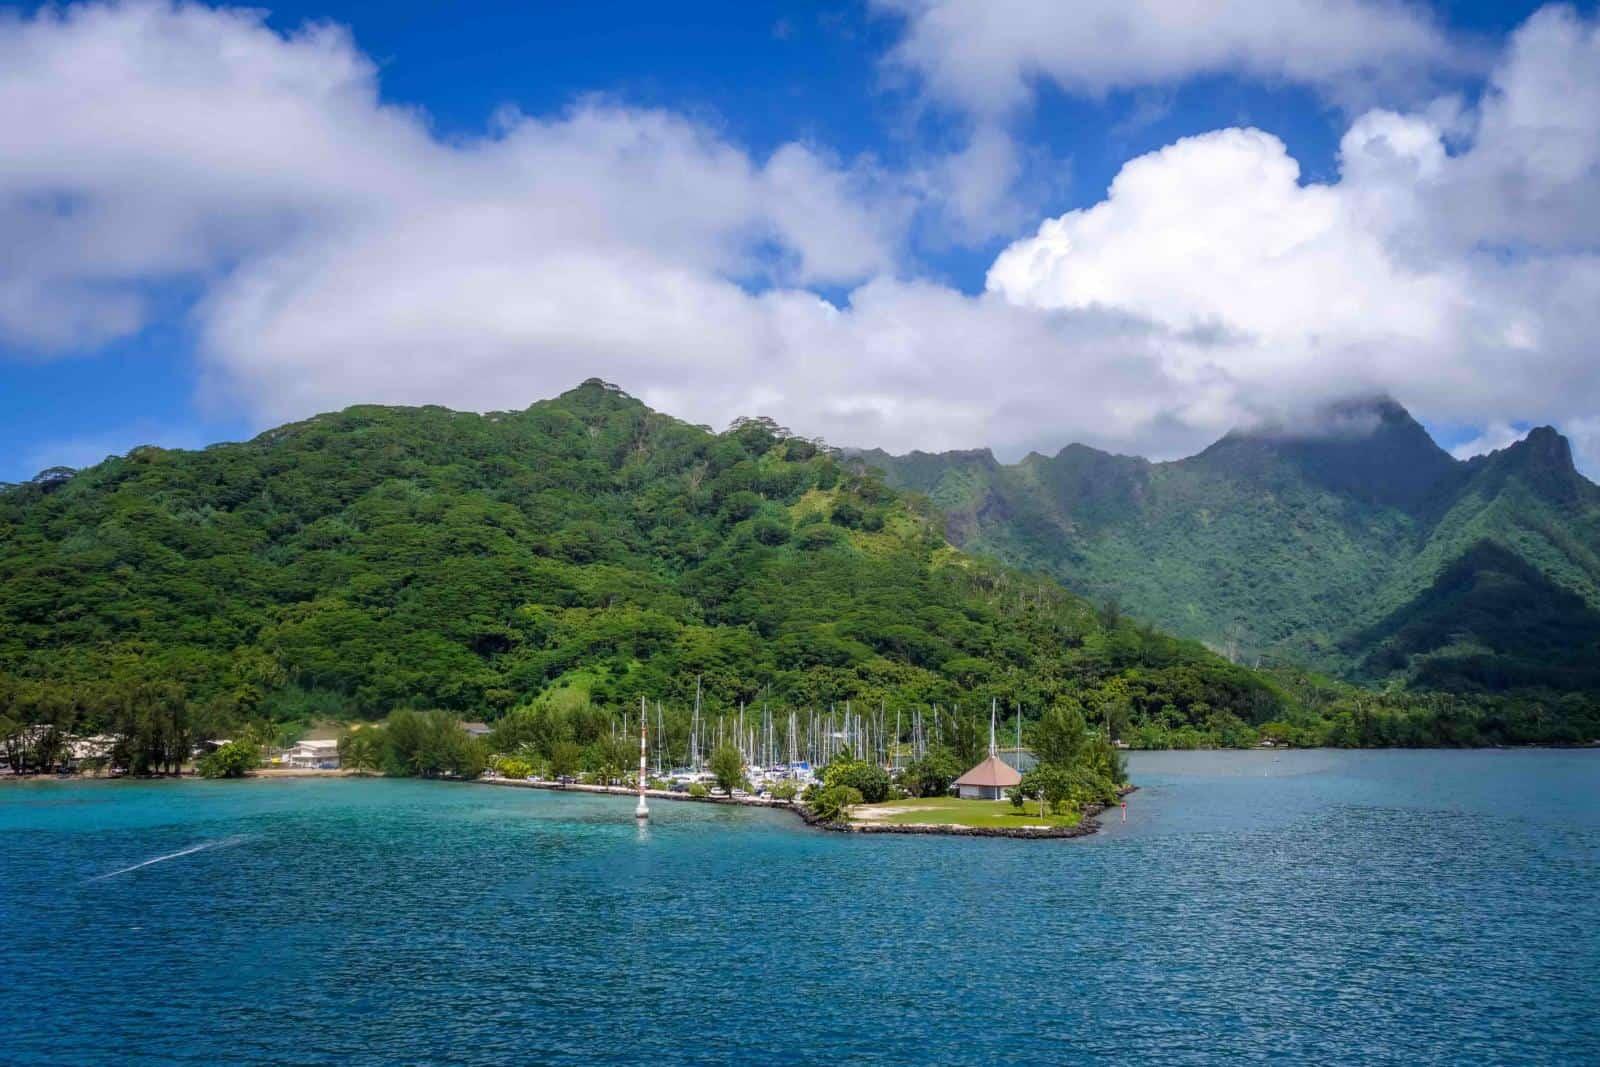 Moorea - Which is the best island - Tahiti vs Bora Bora vs Moorea